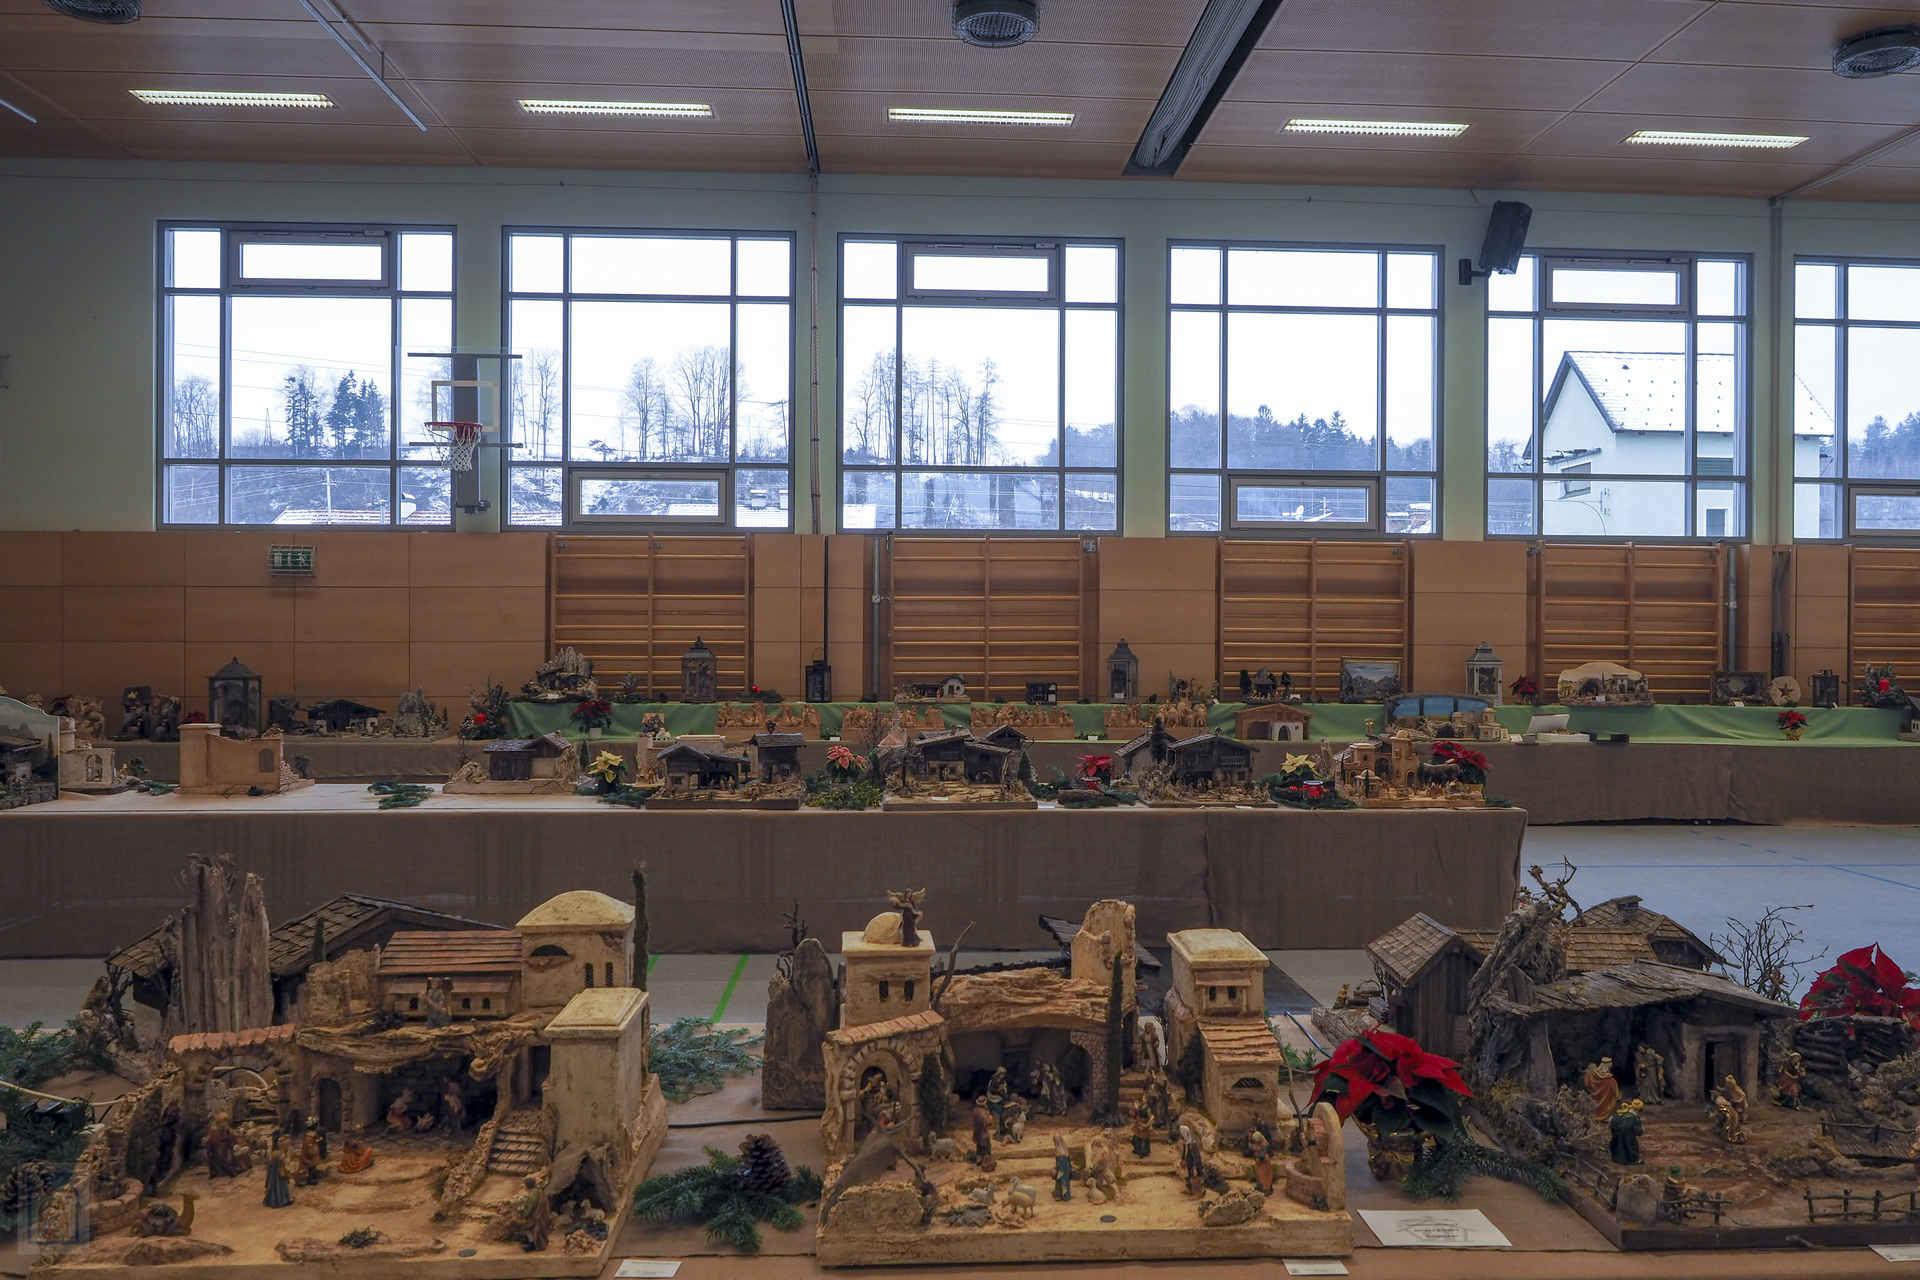 Spielgruppe in der Region Braunau - carolinavolksfolks.com